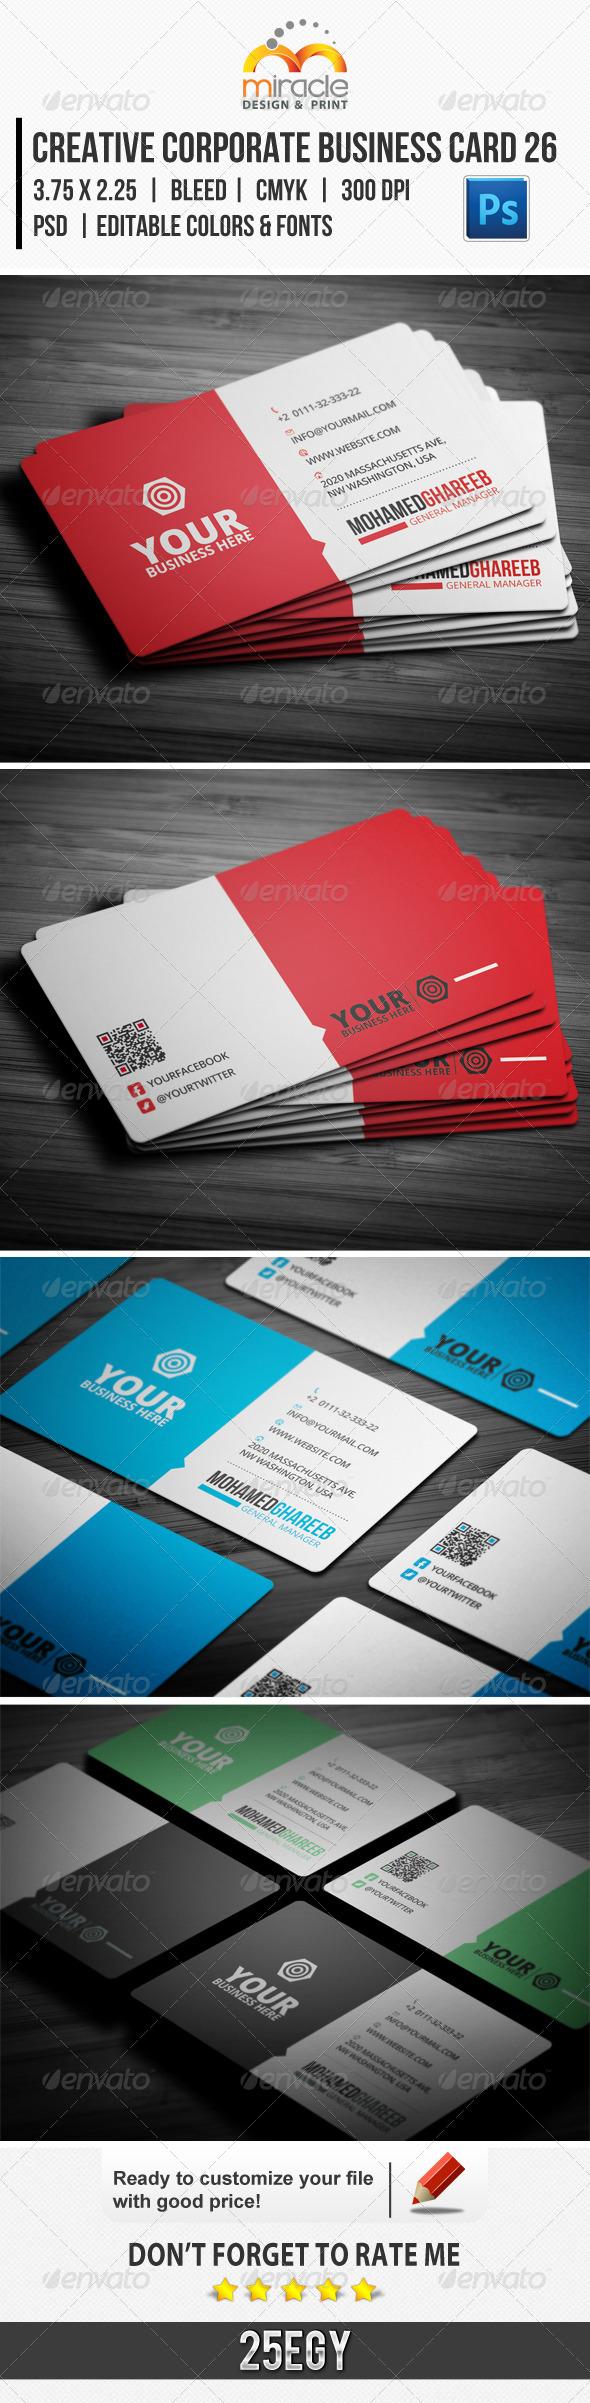 Creative Corporate Business Card 26 - Corporate Business Cards